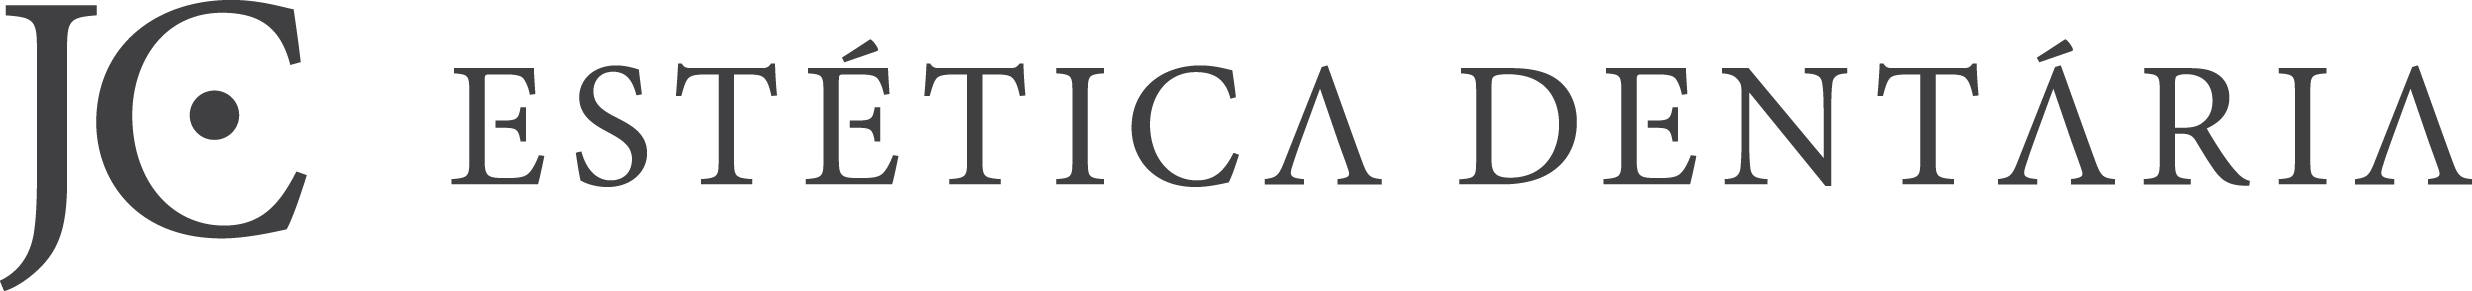 390x99 logo